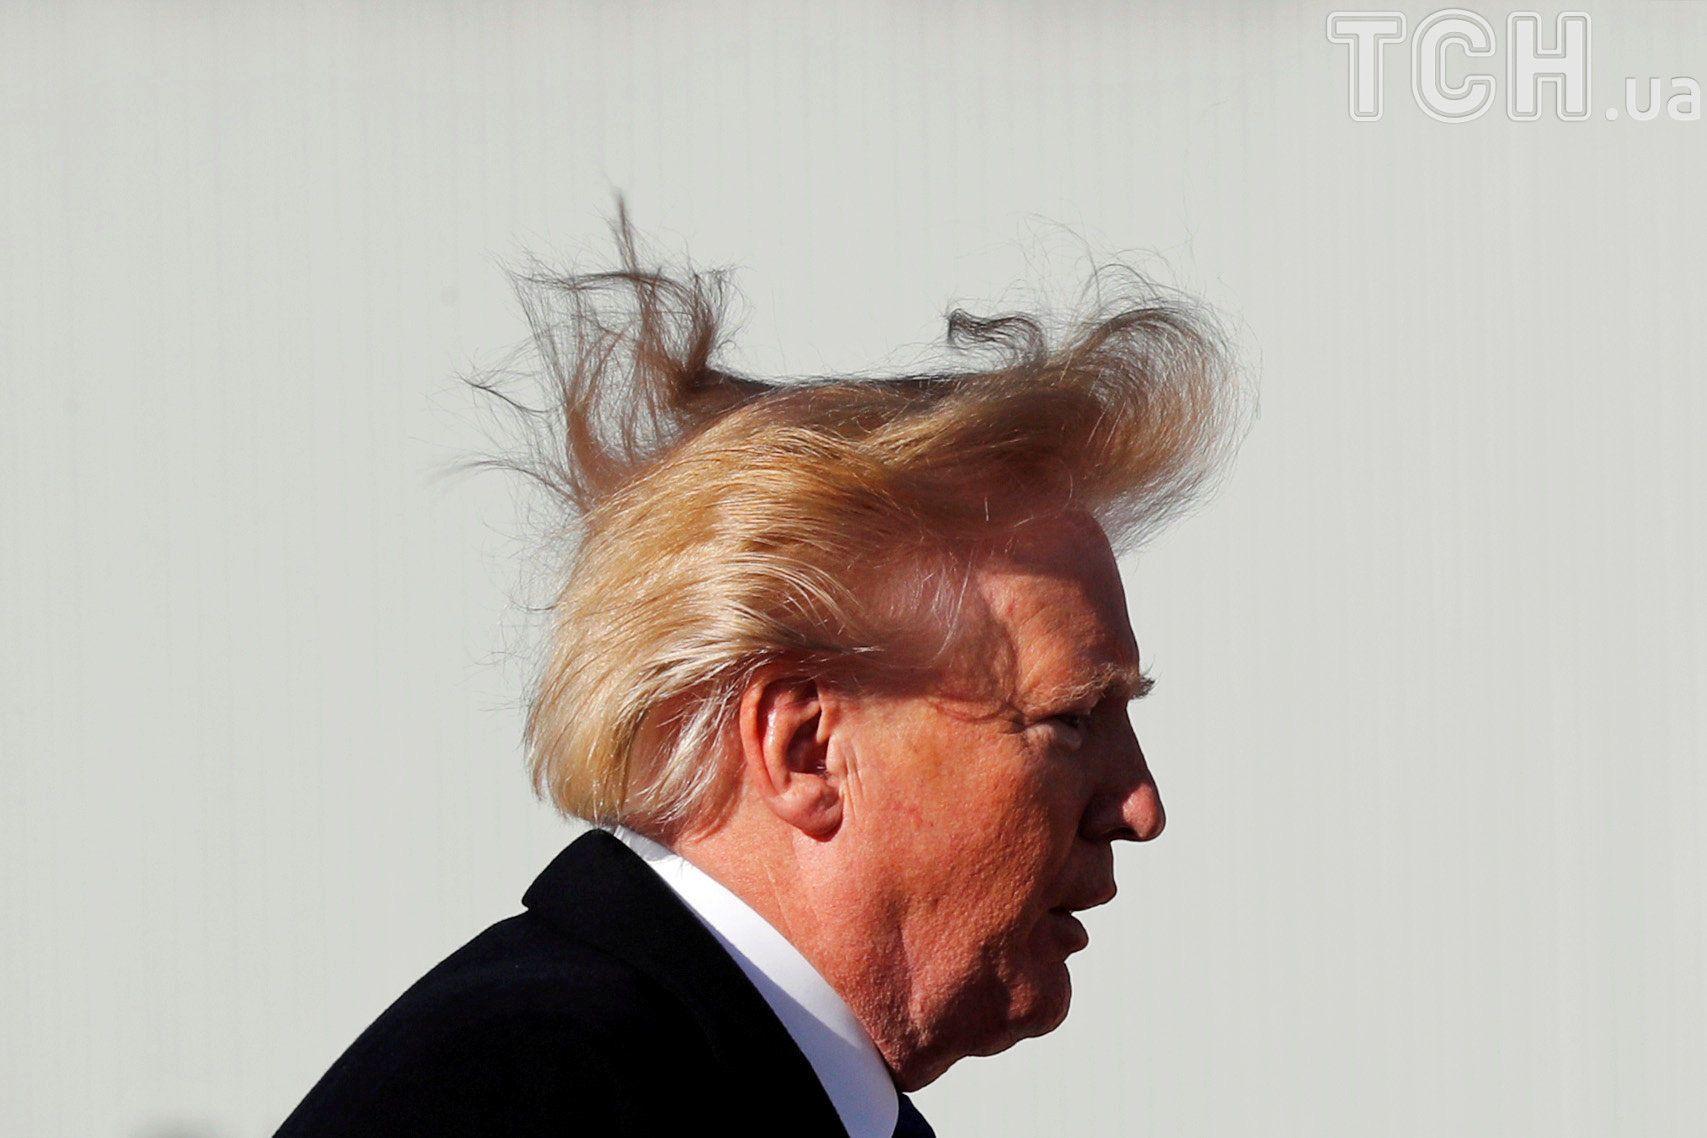 Цвет волос трампа